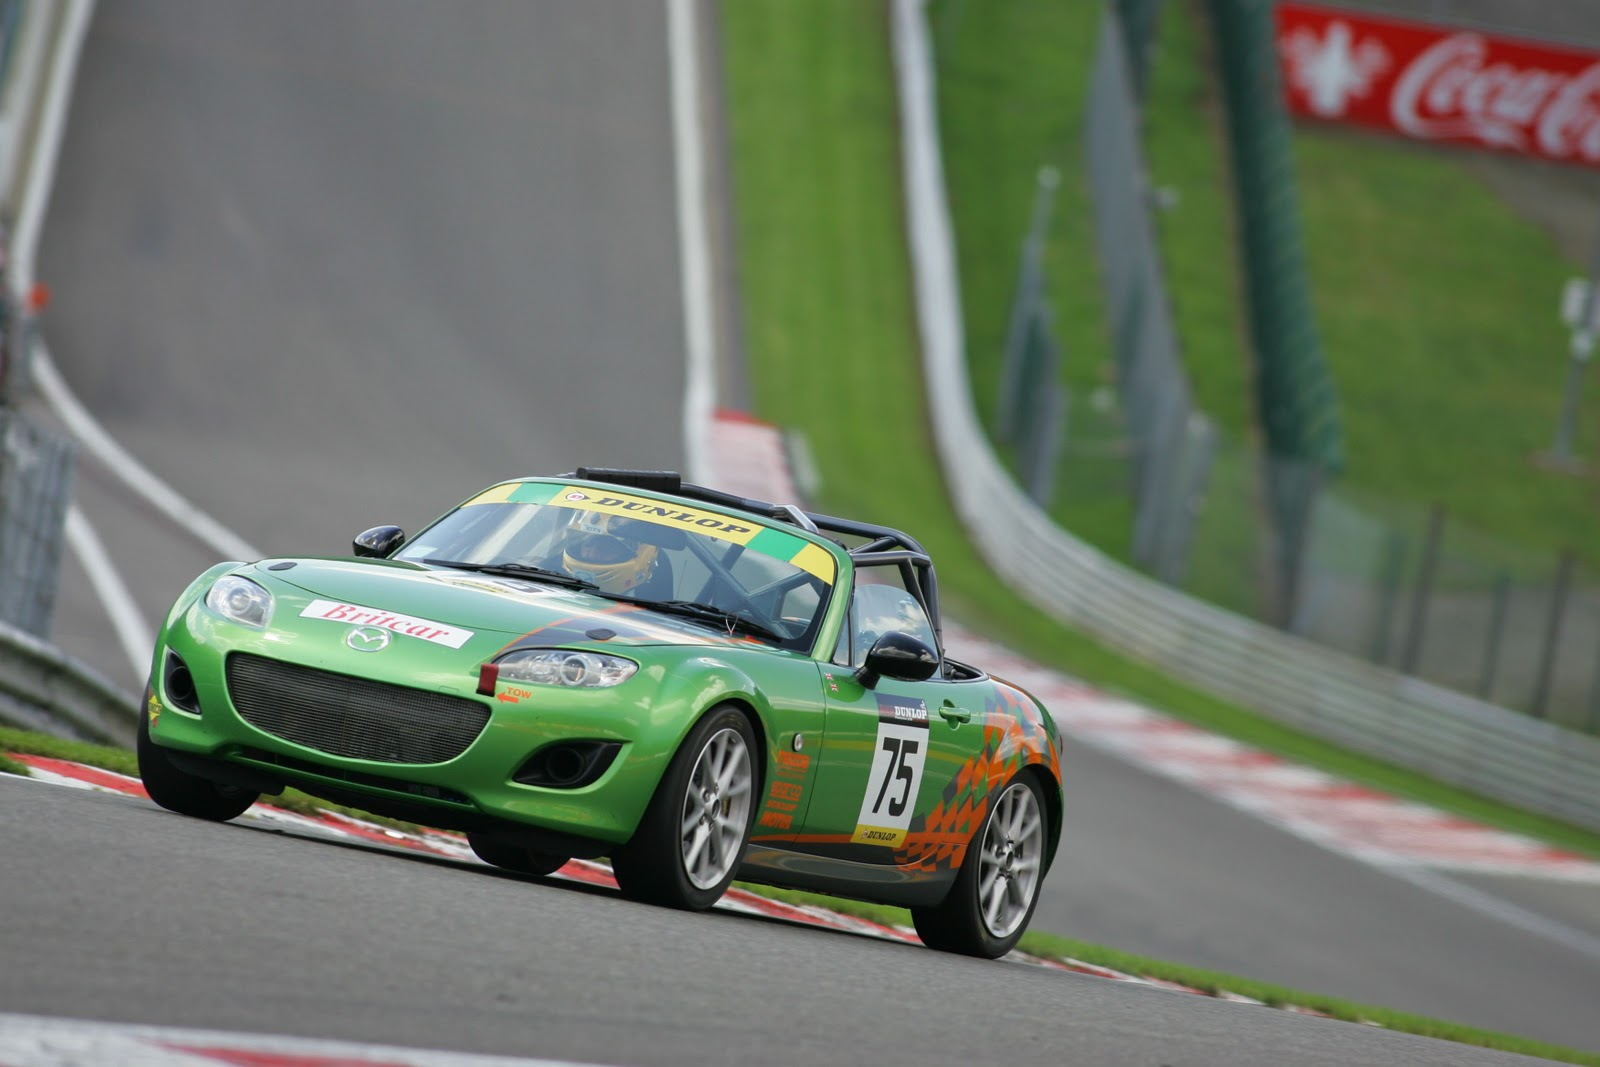 http://4.bp.blogspot.com/-K48jNzQdFQw/TyOUO5qyDxI/AAAAAAAAANQ/juoAZAJ-1ok/s1600/2011-Mazda-MX5-GT-Race-Car5.jpg